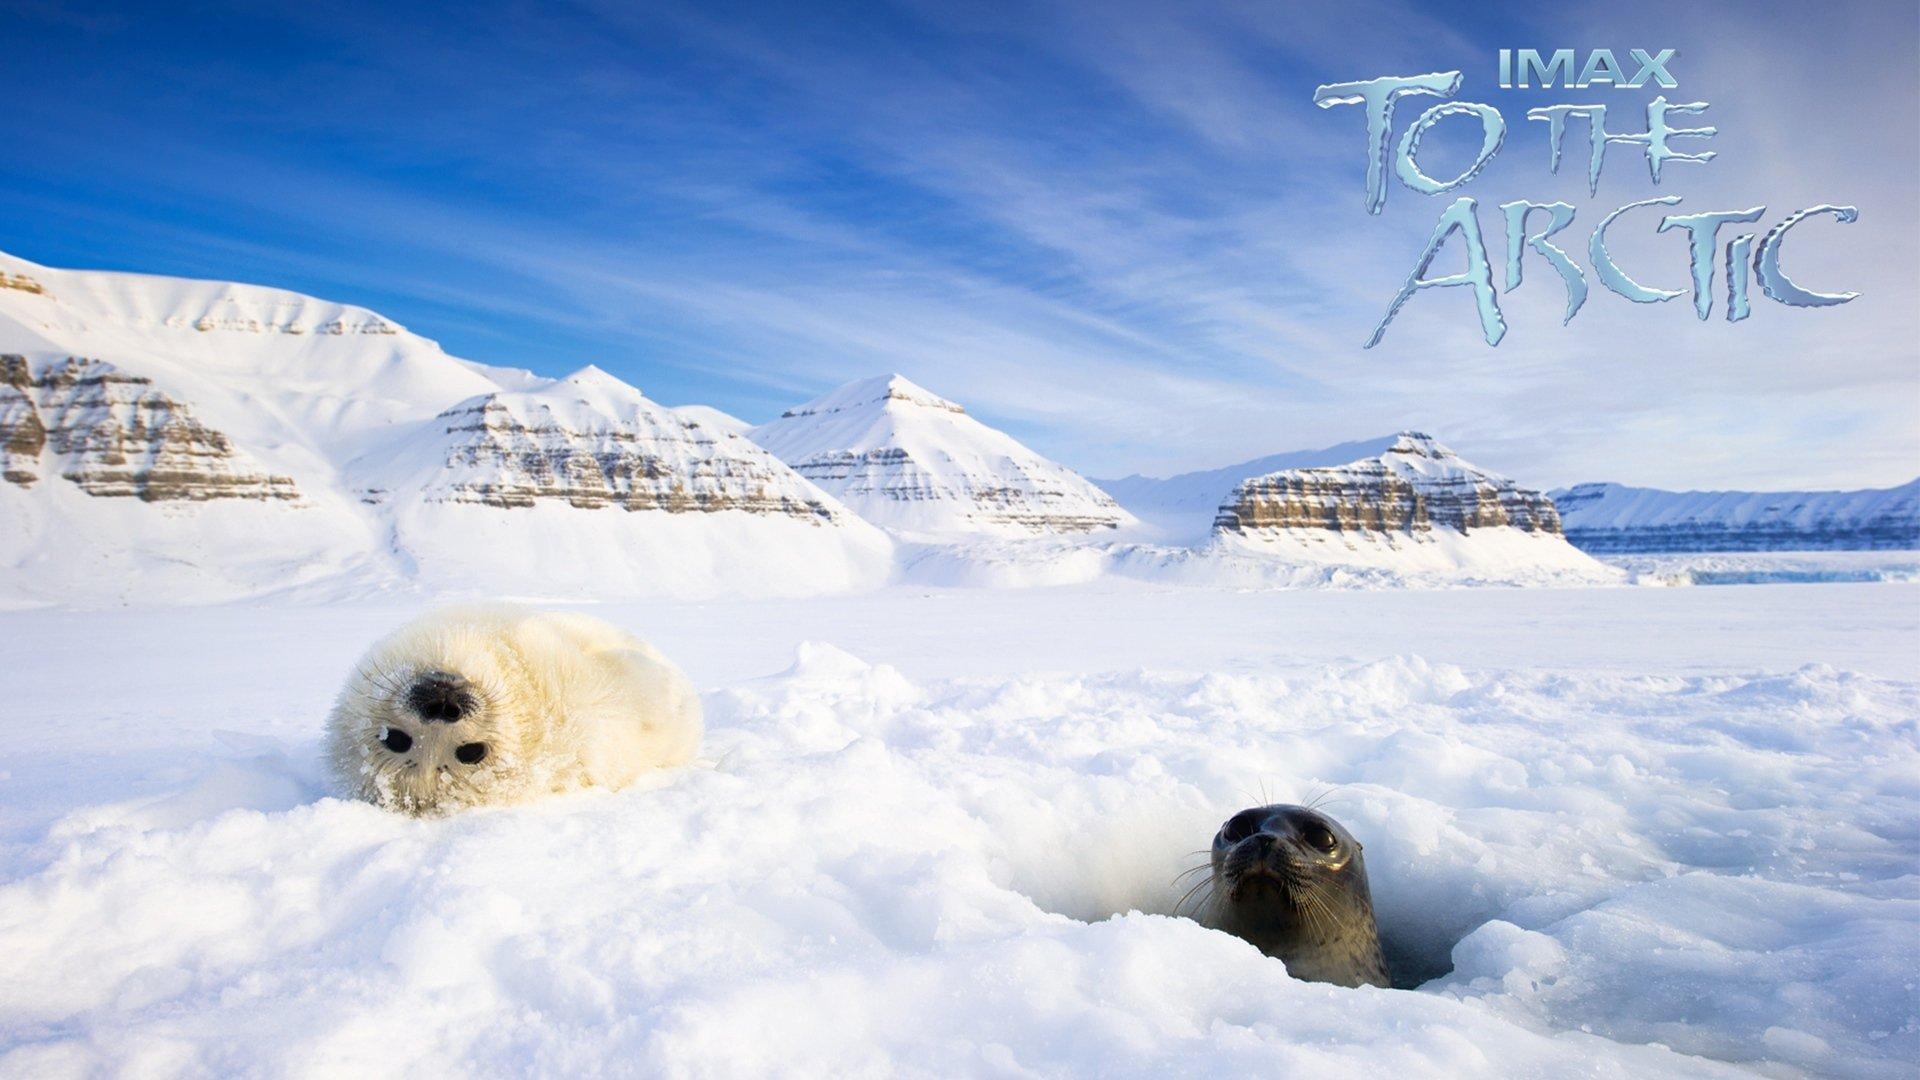 Арктика 3D смотреть фото